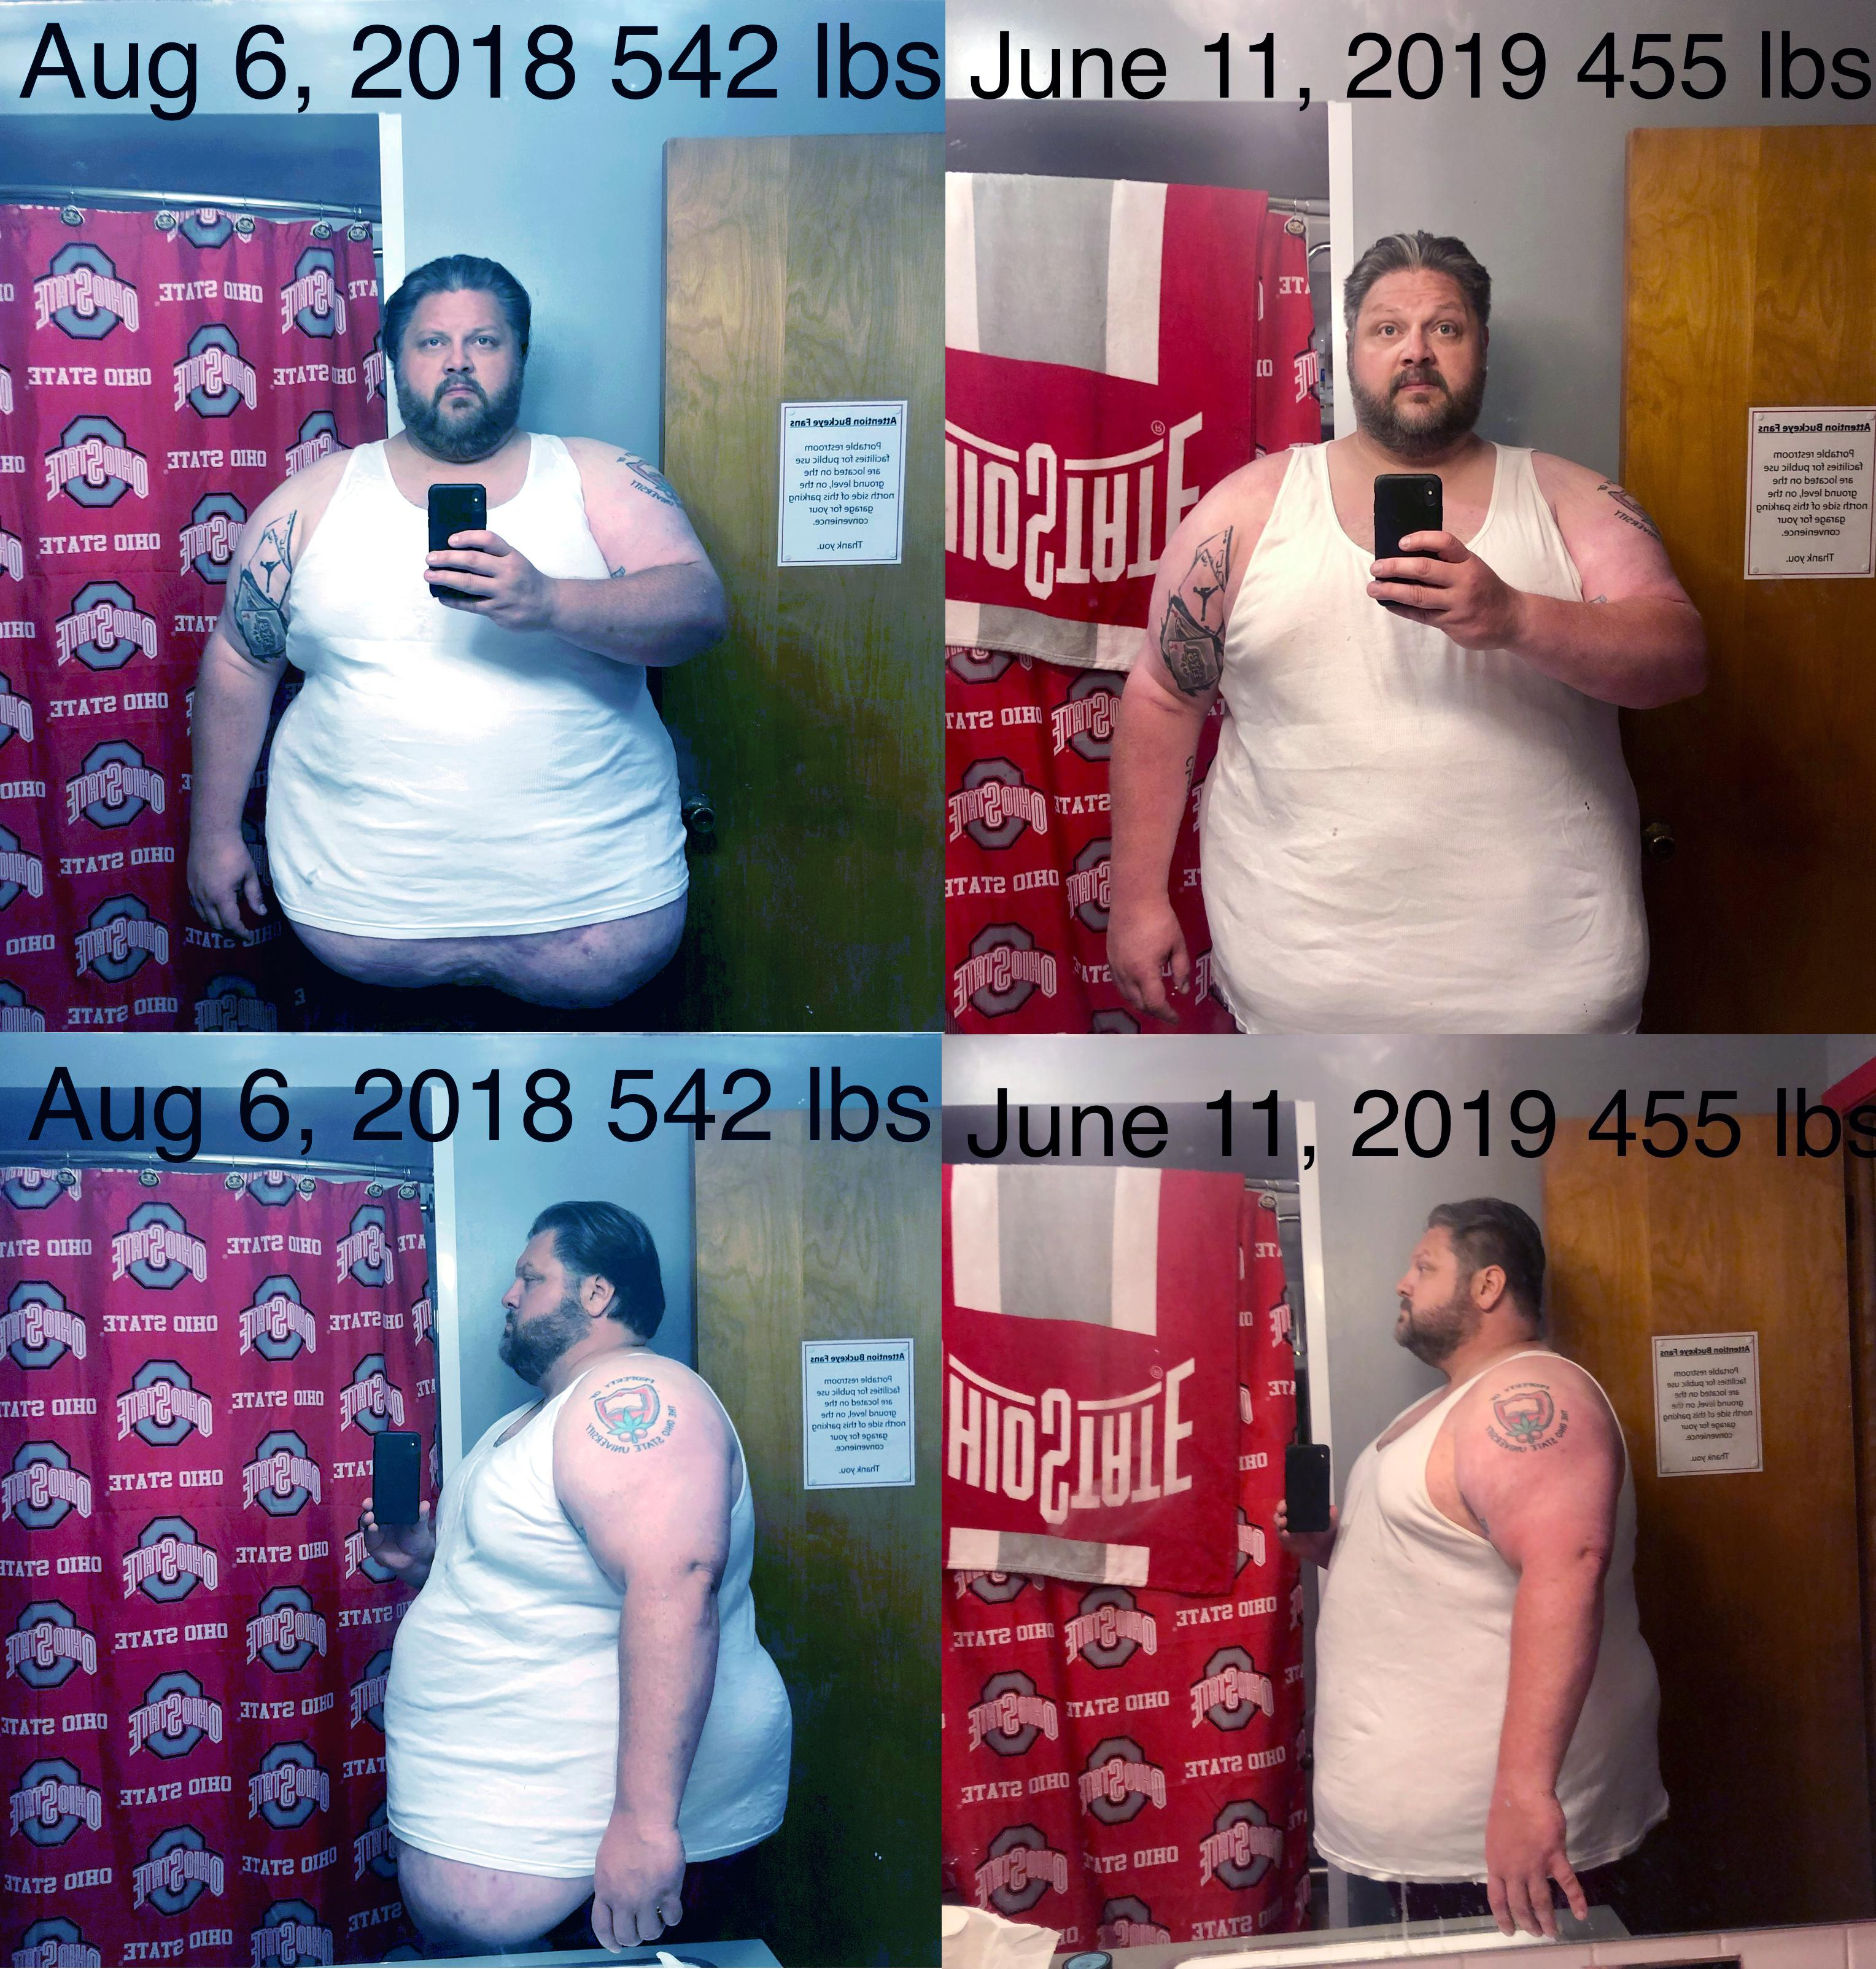 87 lbs Fat Loss 6 foot 1 Male 542 lbs to 455 lbs